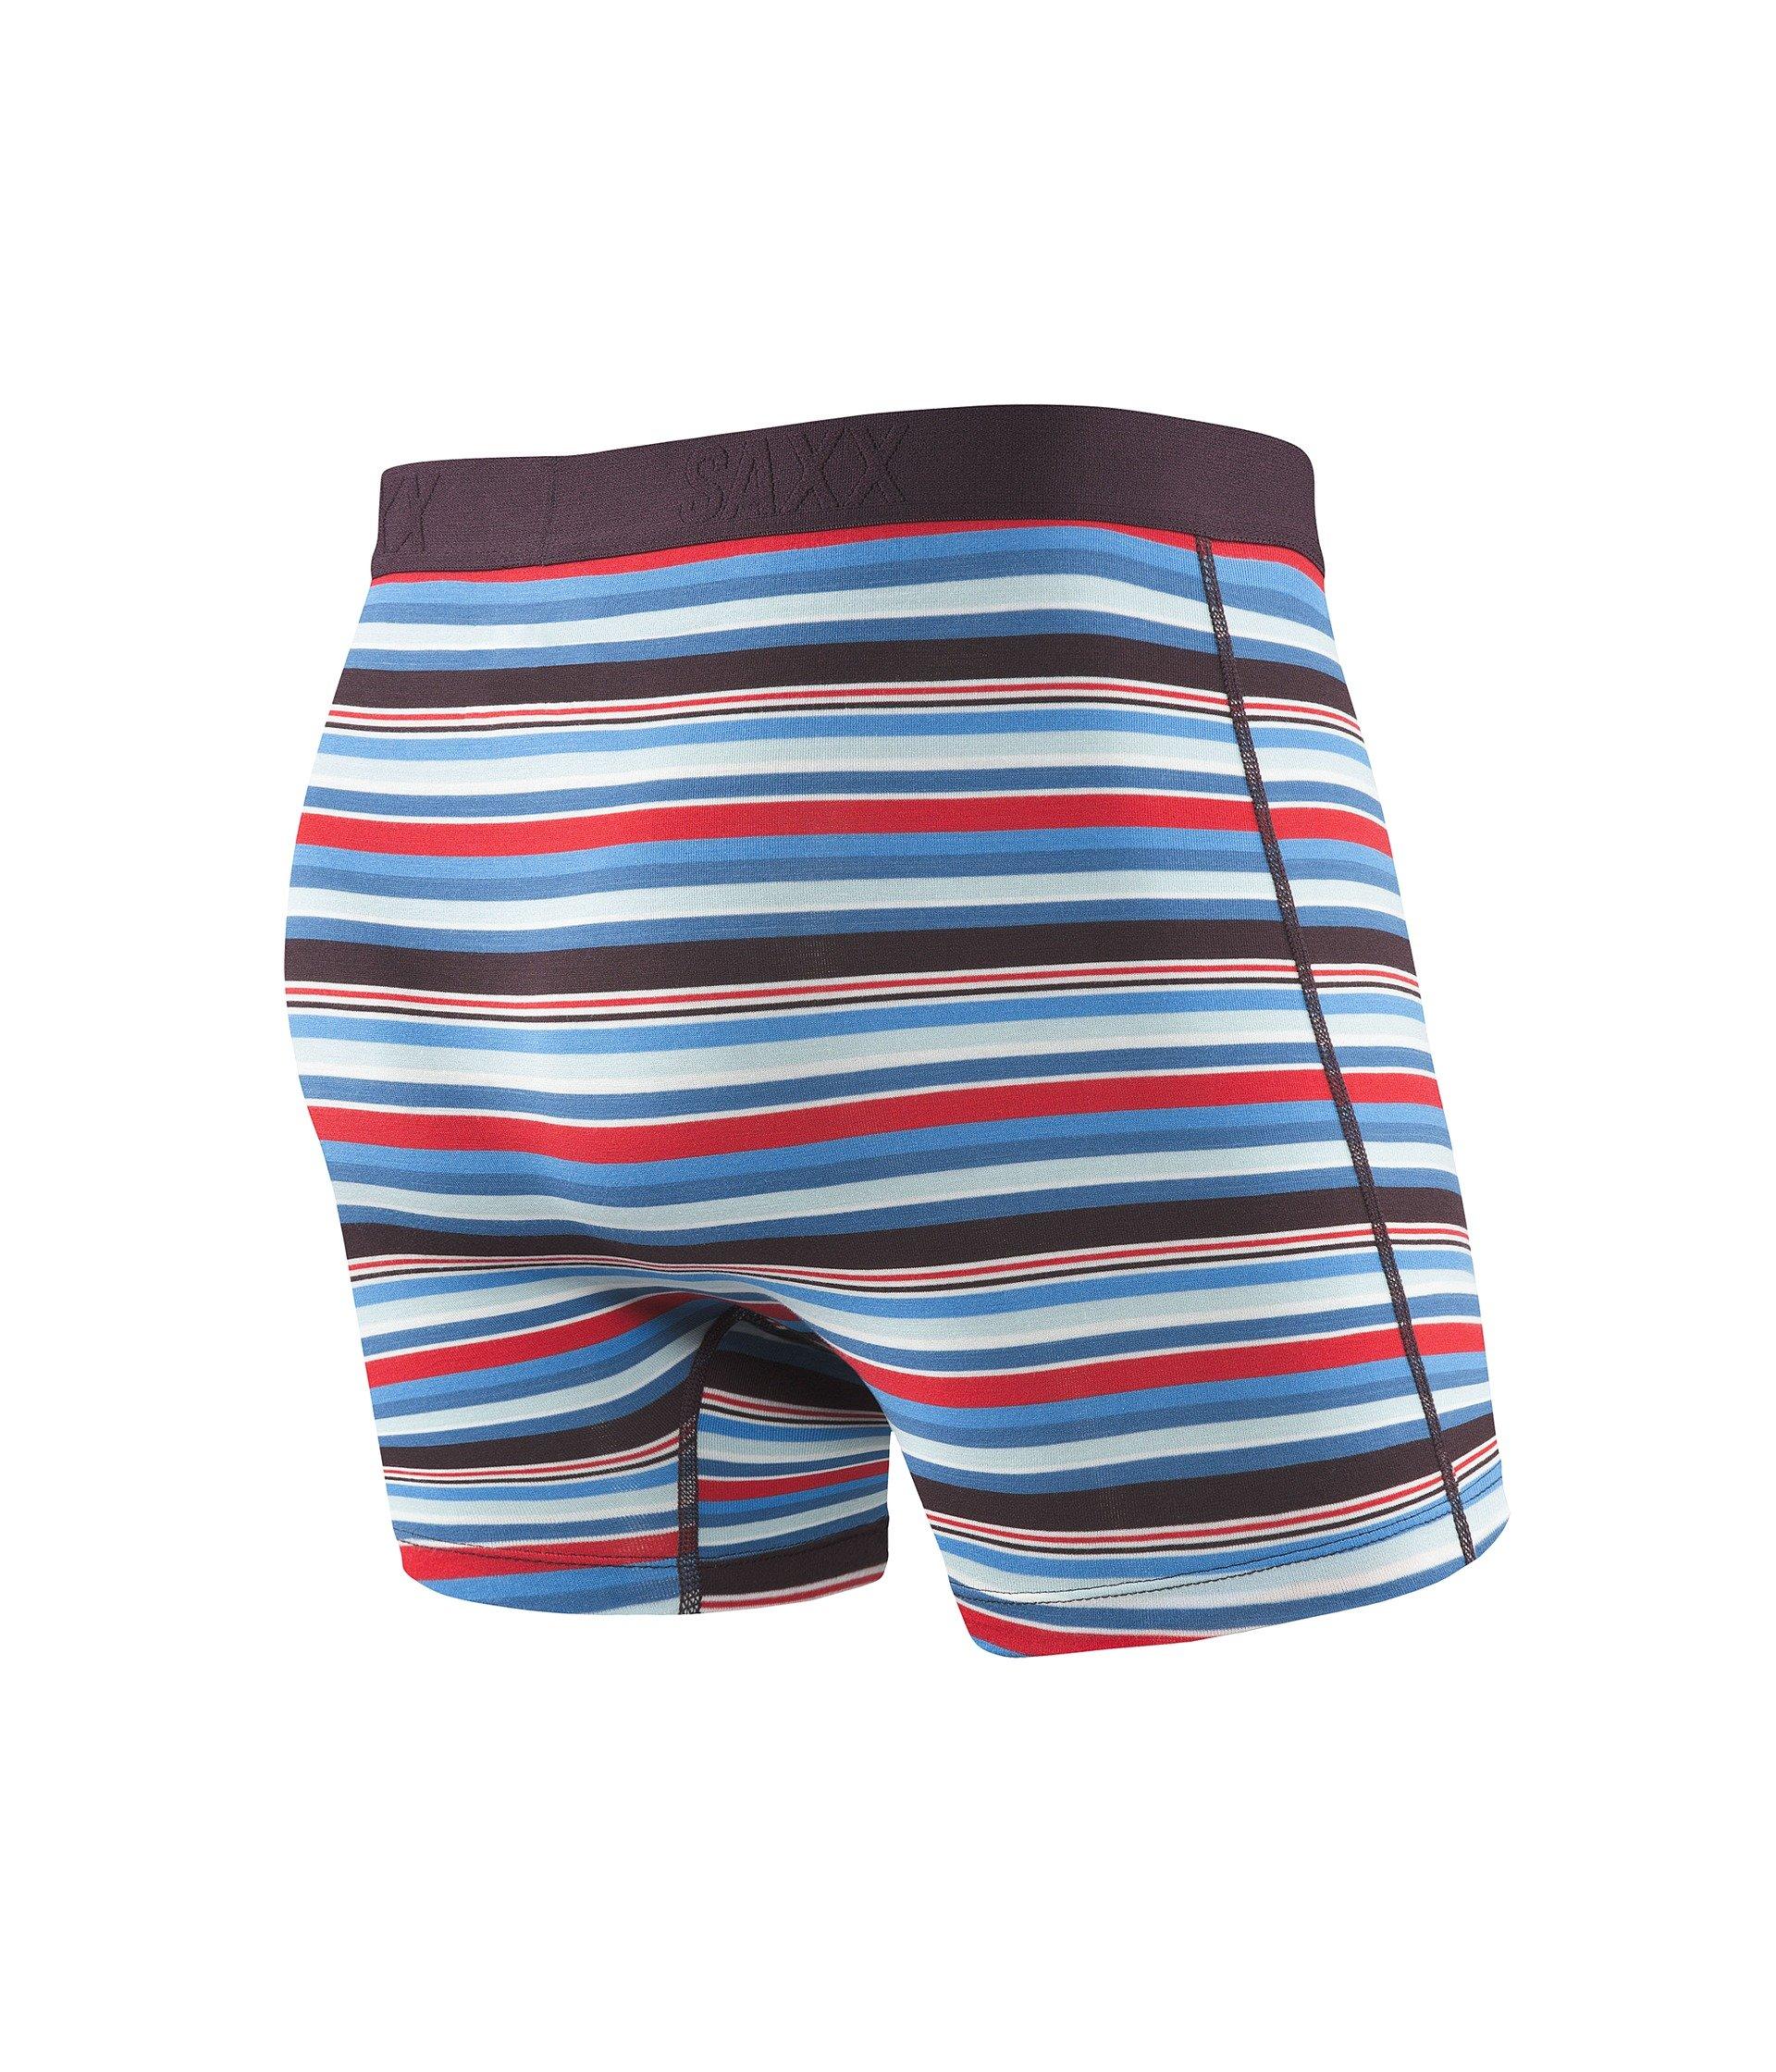 Vibe Fit Stripe Underwear Berry Saxx Camp Boxer Modern wCx45IIqg